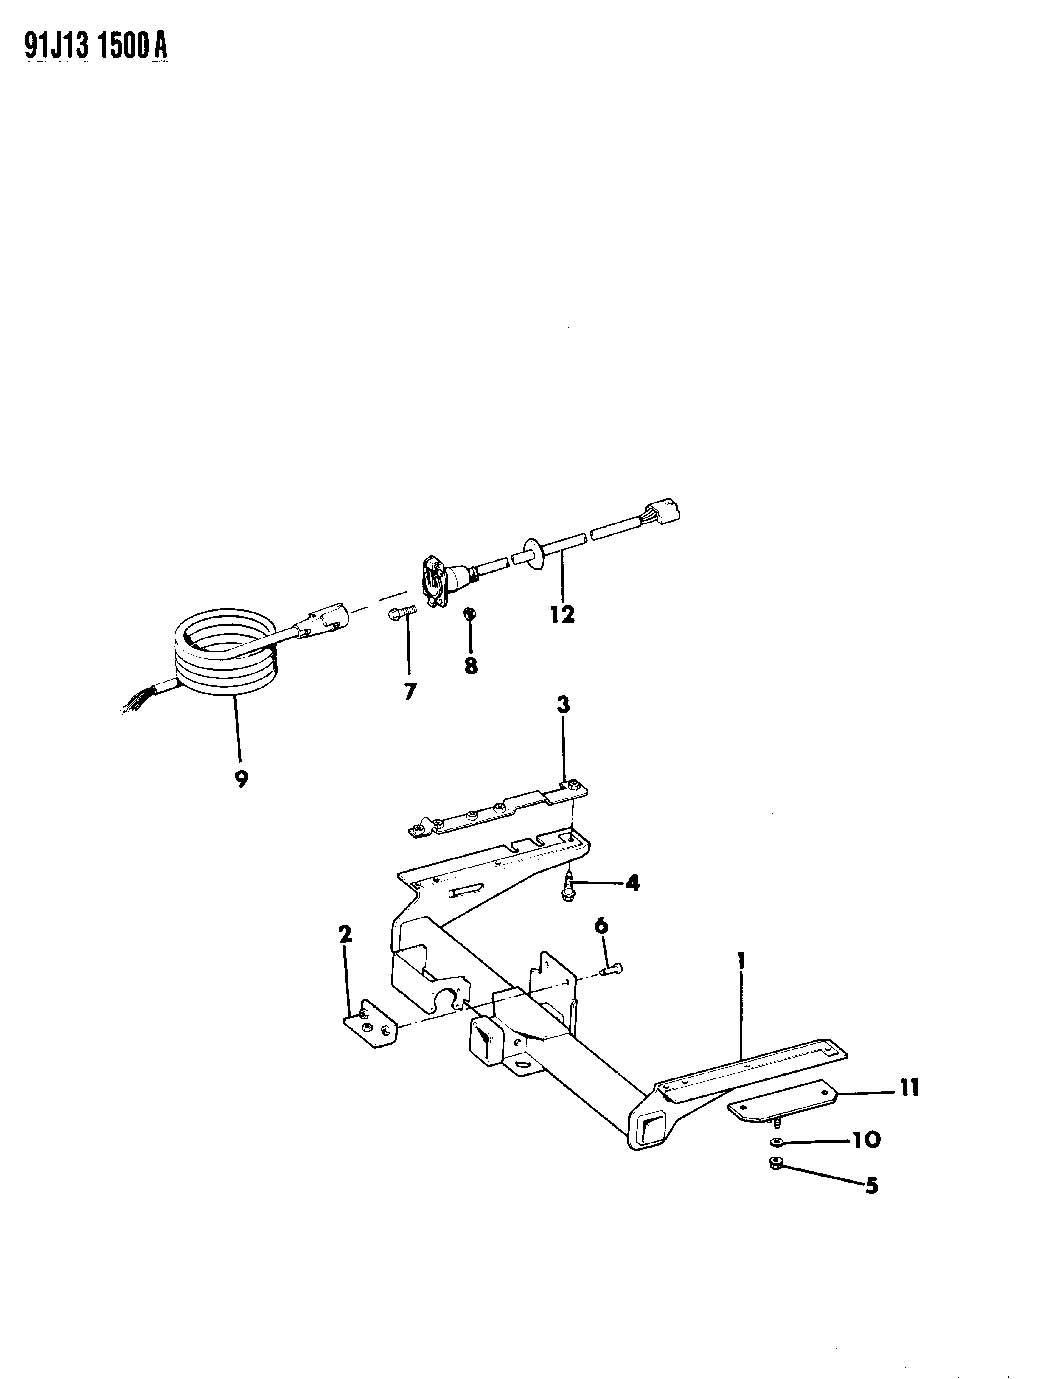 2008 ninja 250 wiring diagram